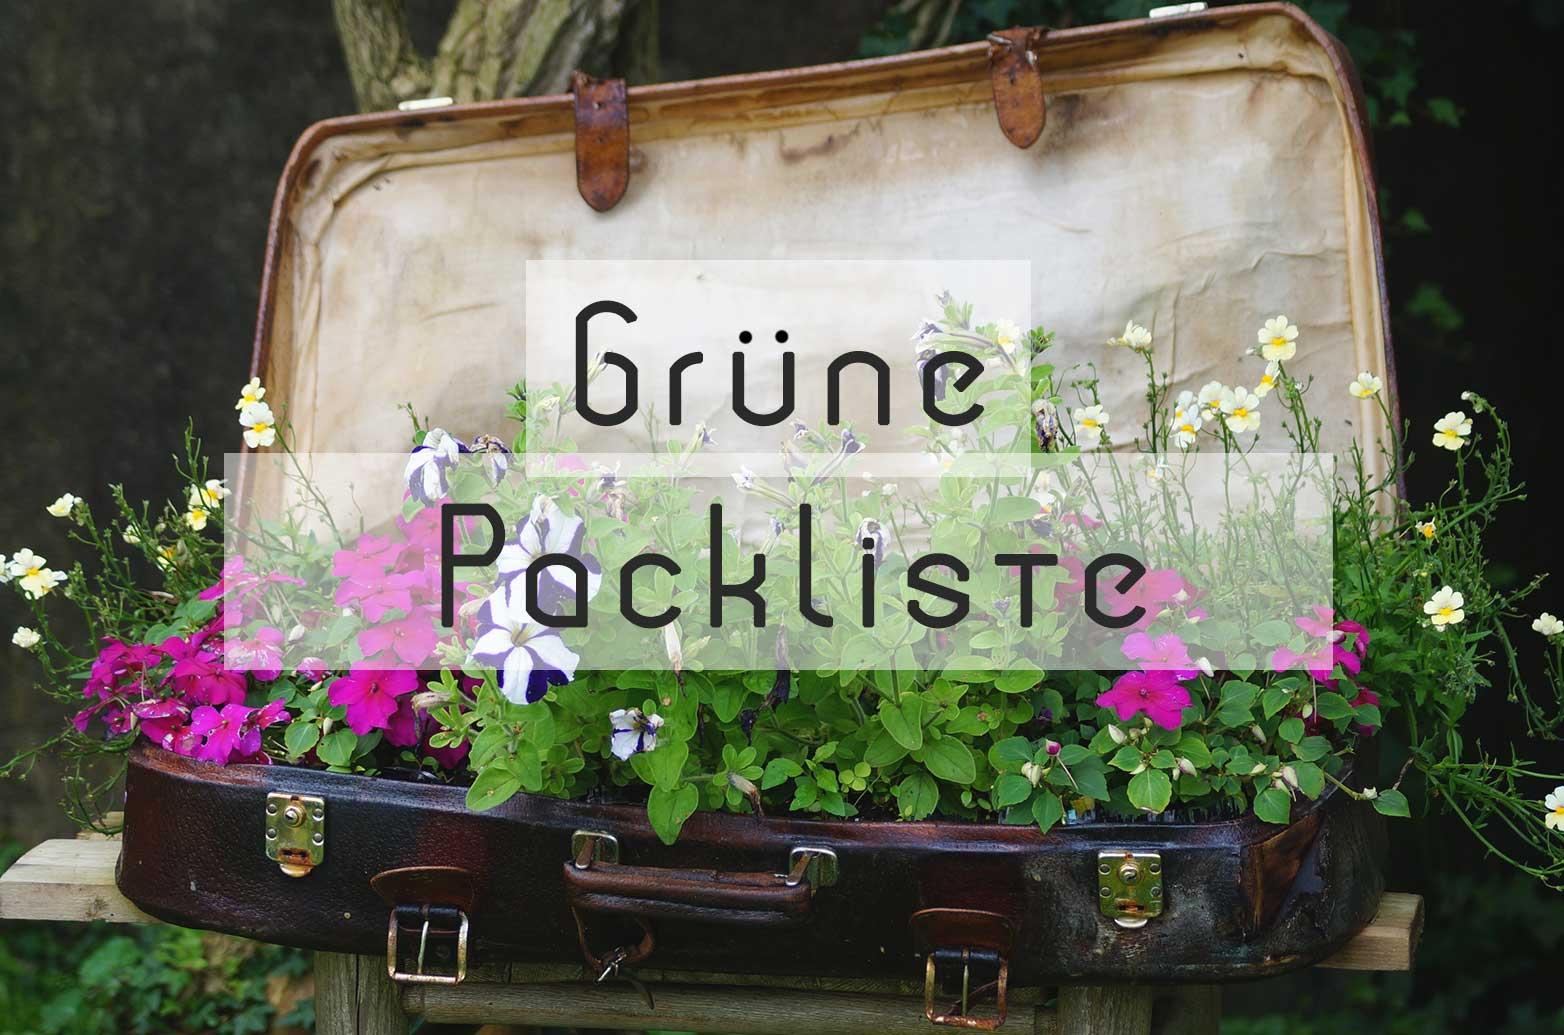 Grüne Checkliste nachhaltiger Urlaub